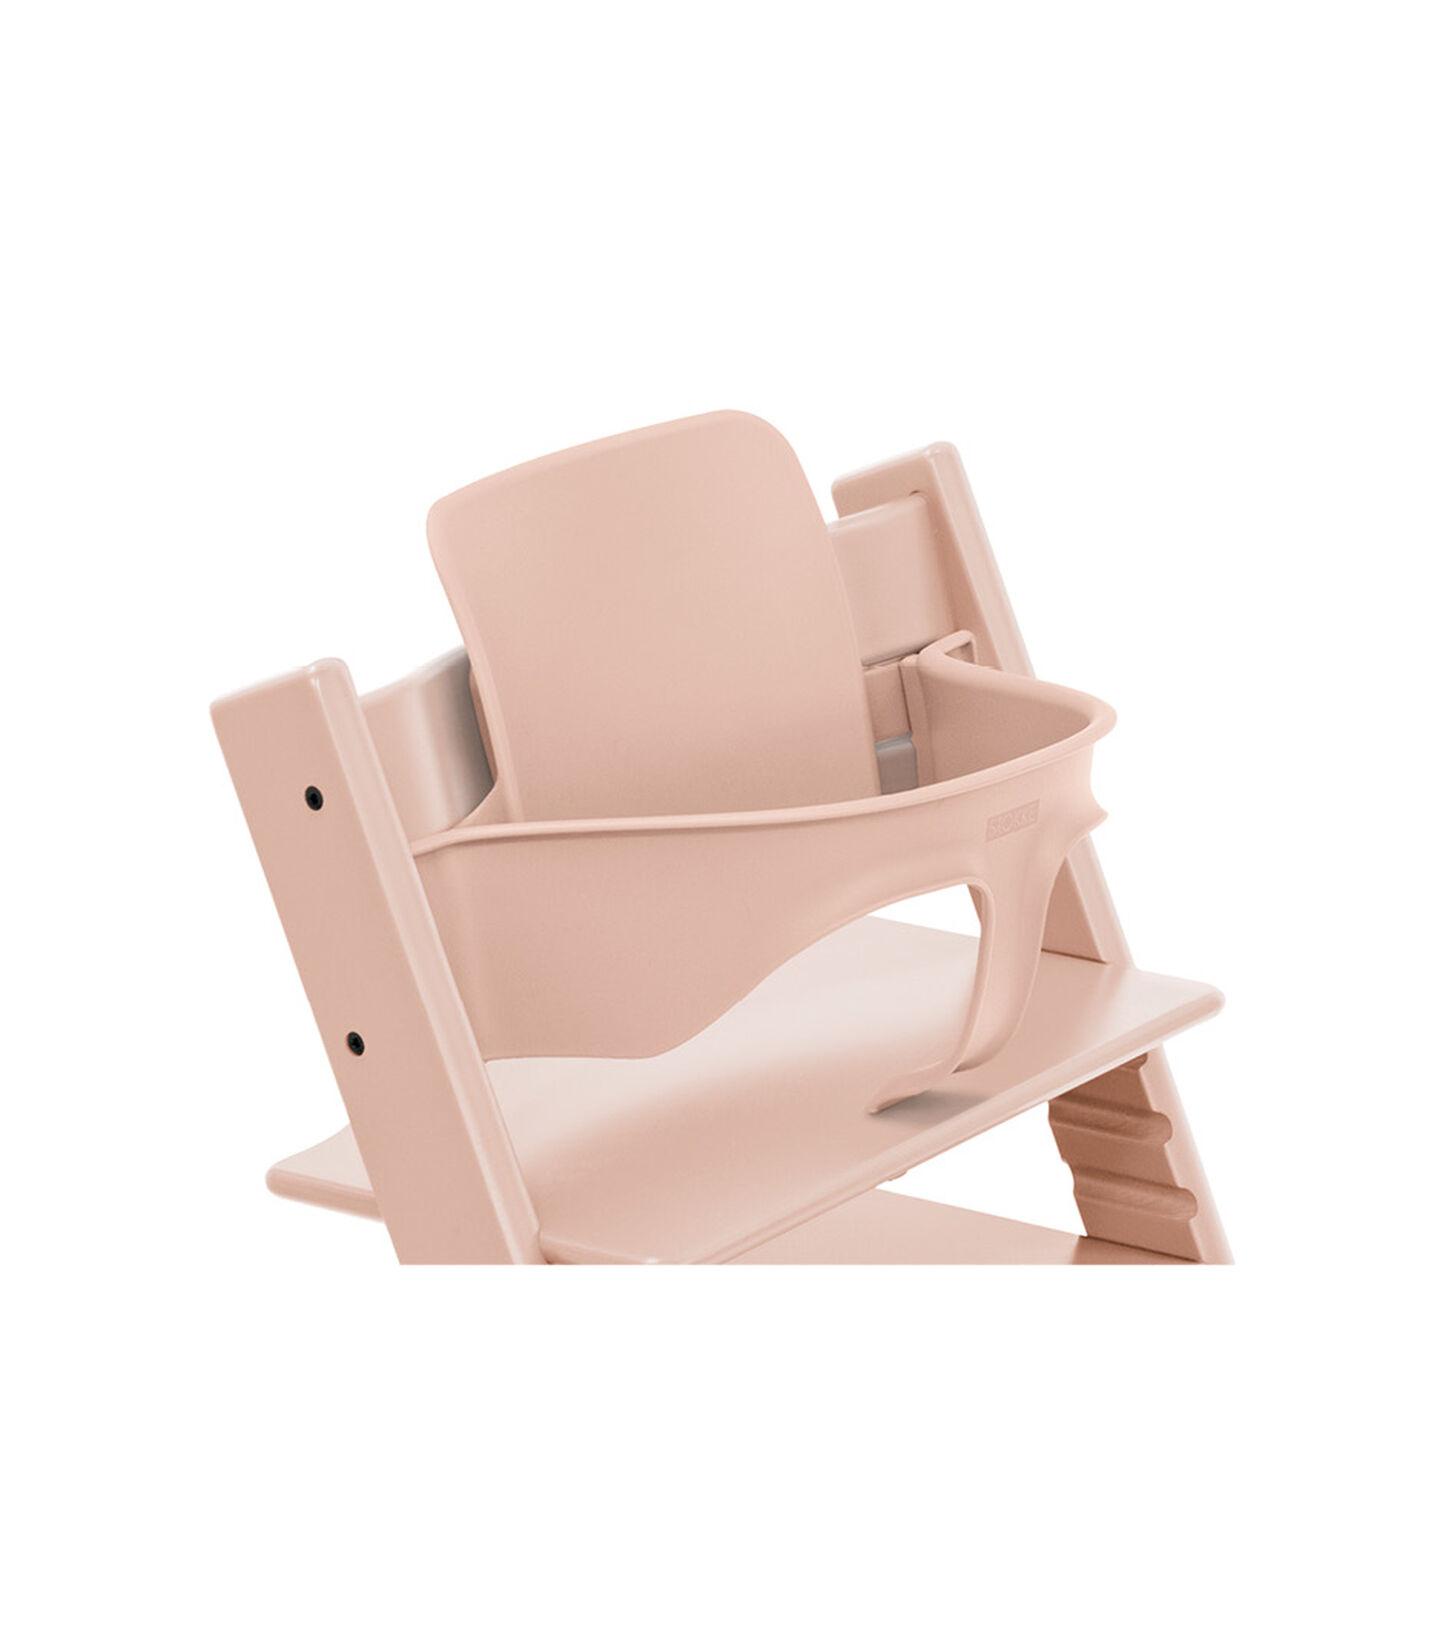 Tripp Trapp® Baby Set Serene Pink, Serene Pink, mainview view 2